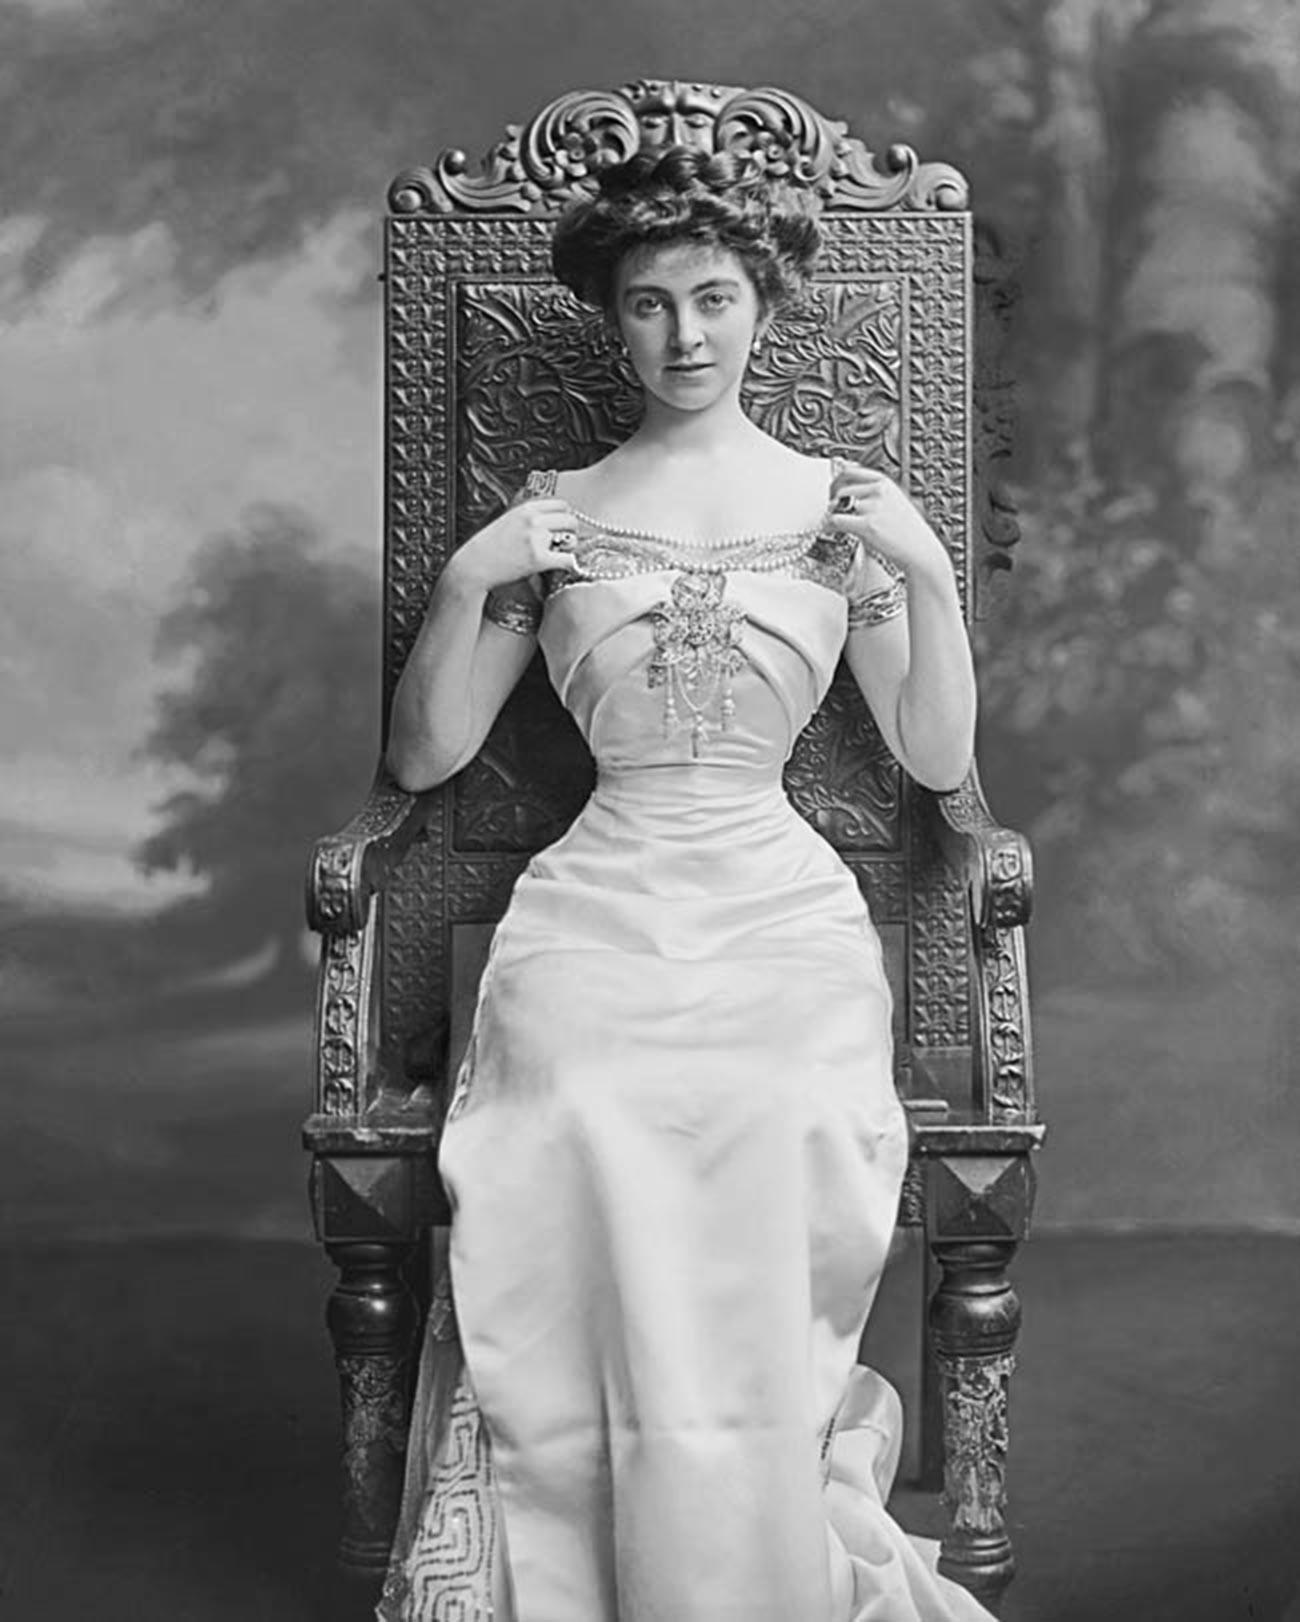 Constance Edwina Cornwallis-West